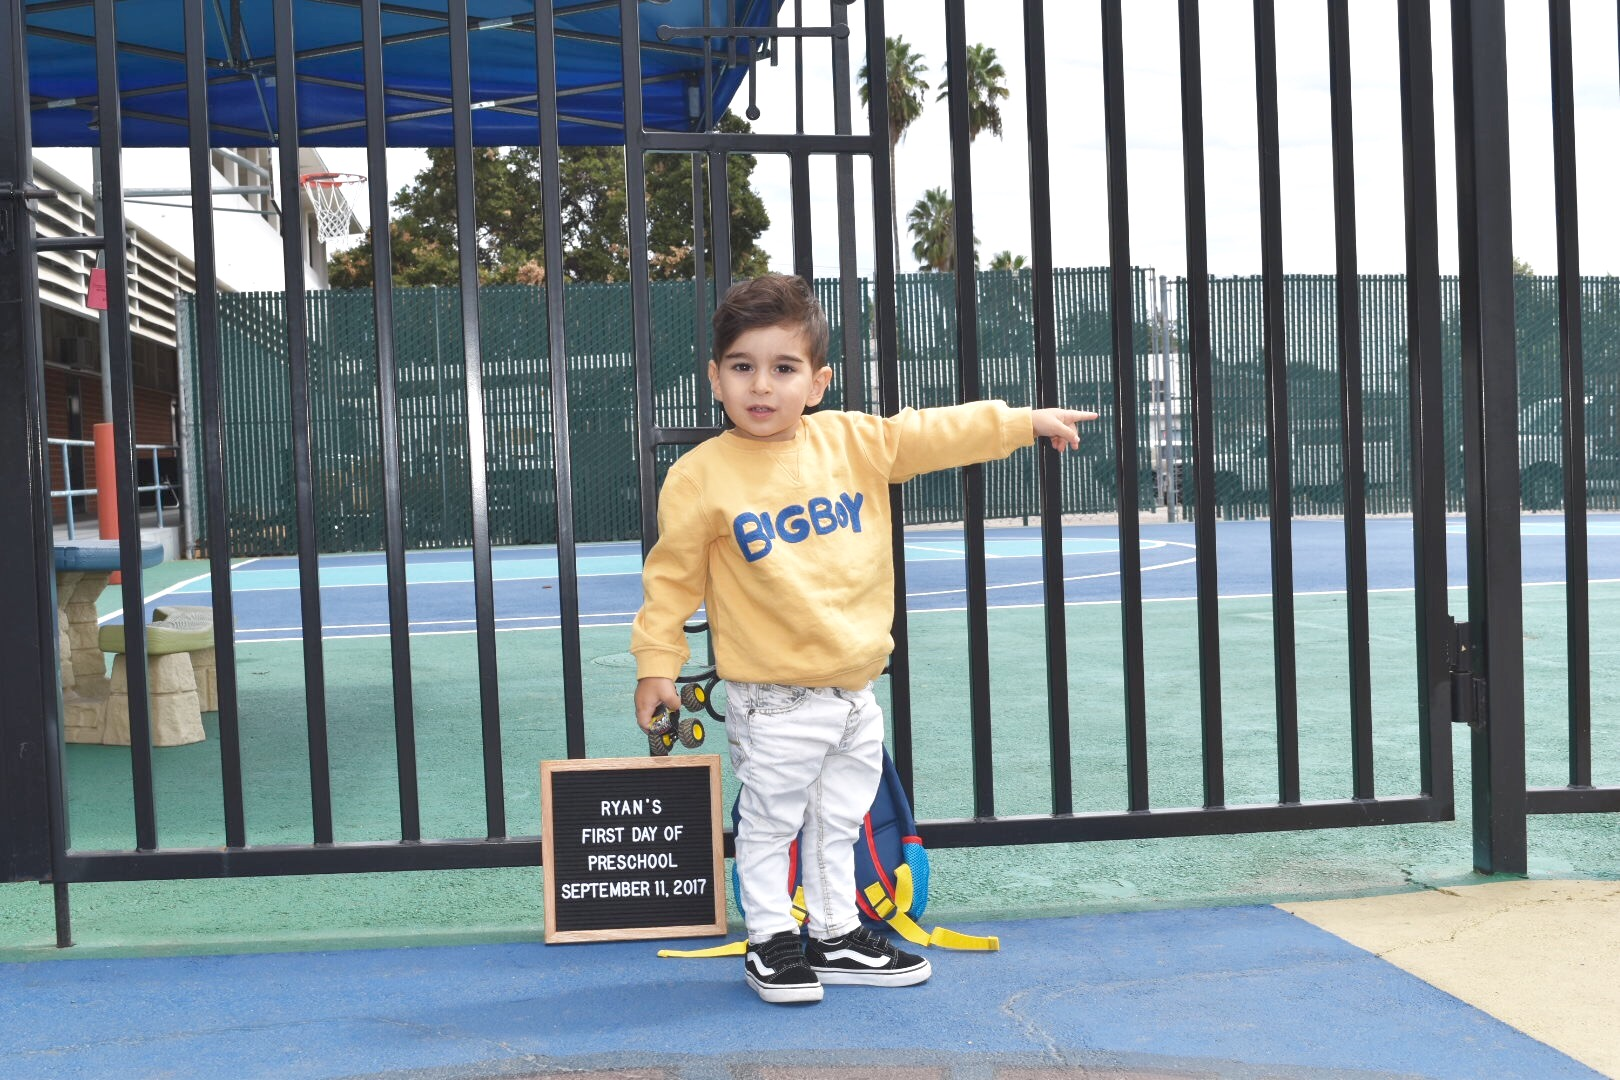 ryan preschool 1